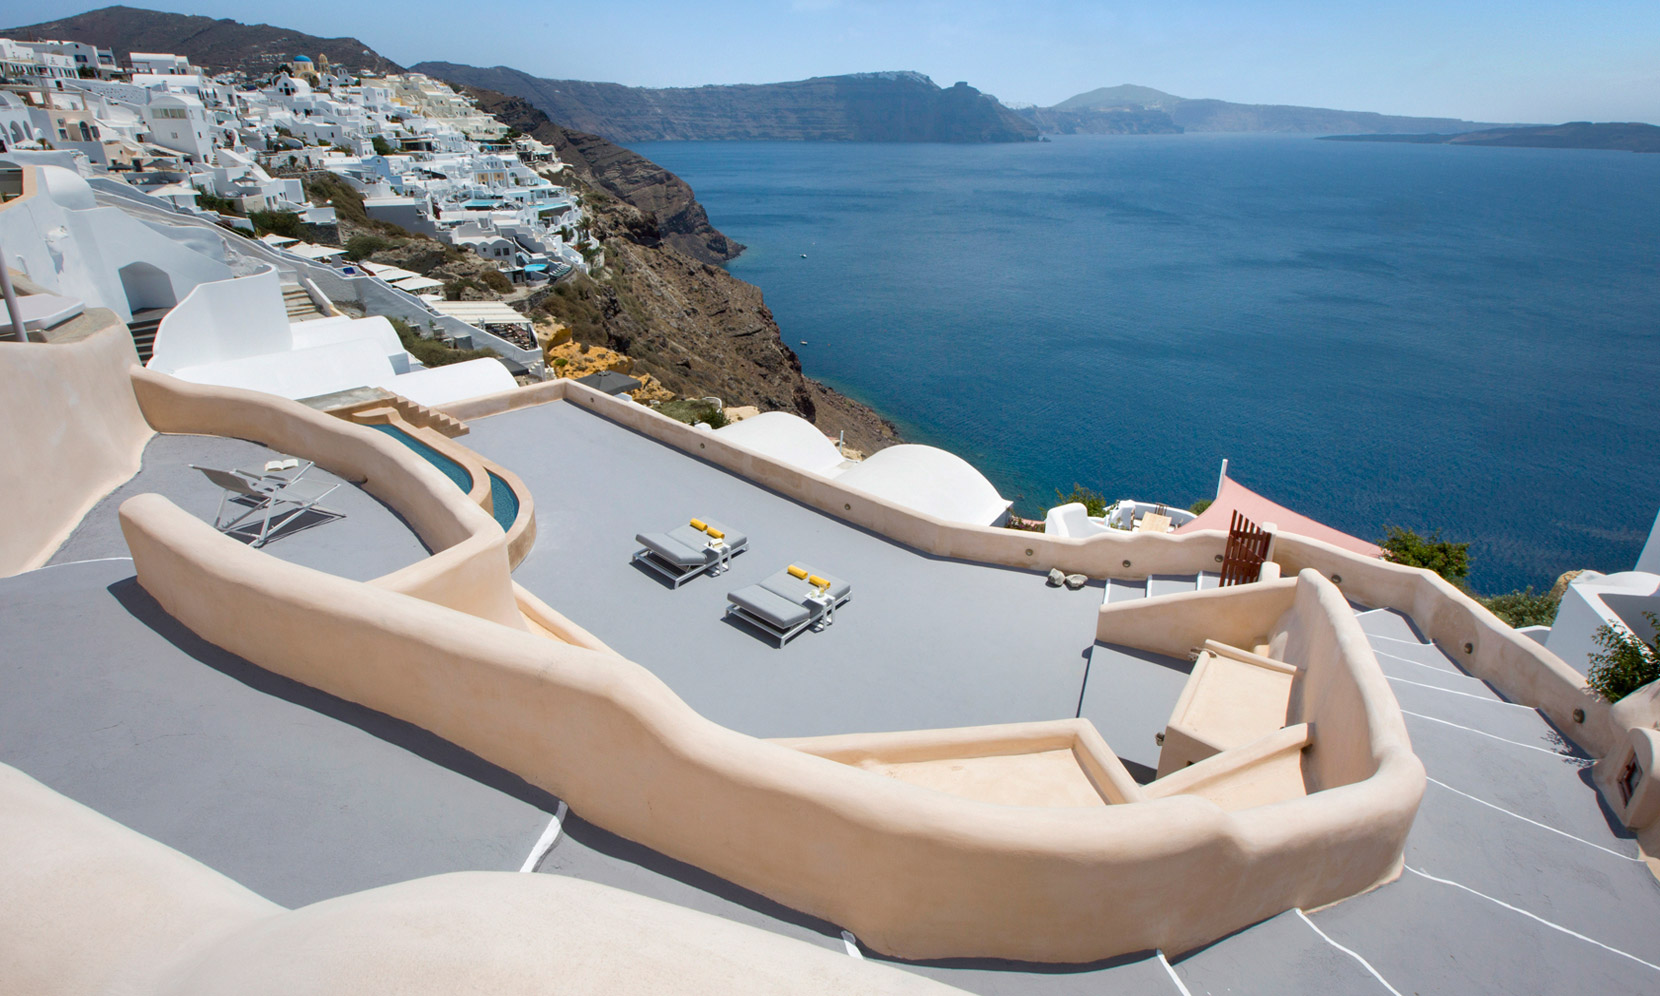 Santorini Villa Minima jumbotron image